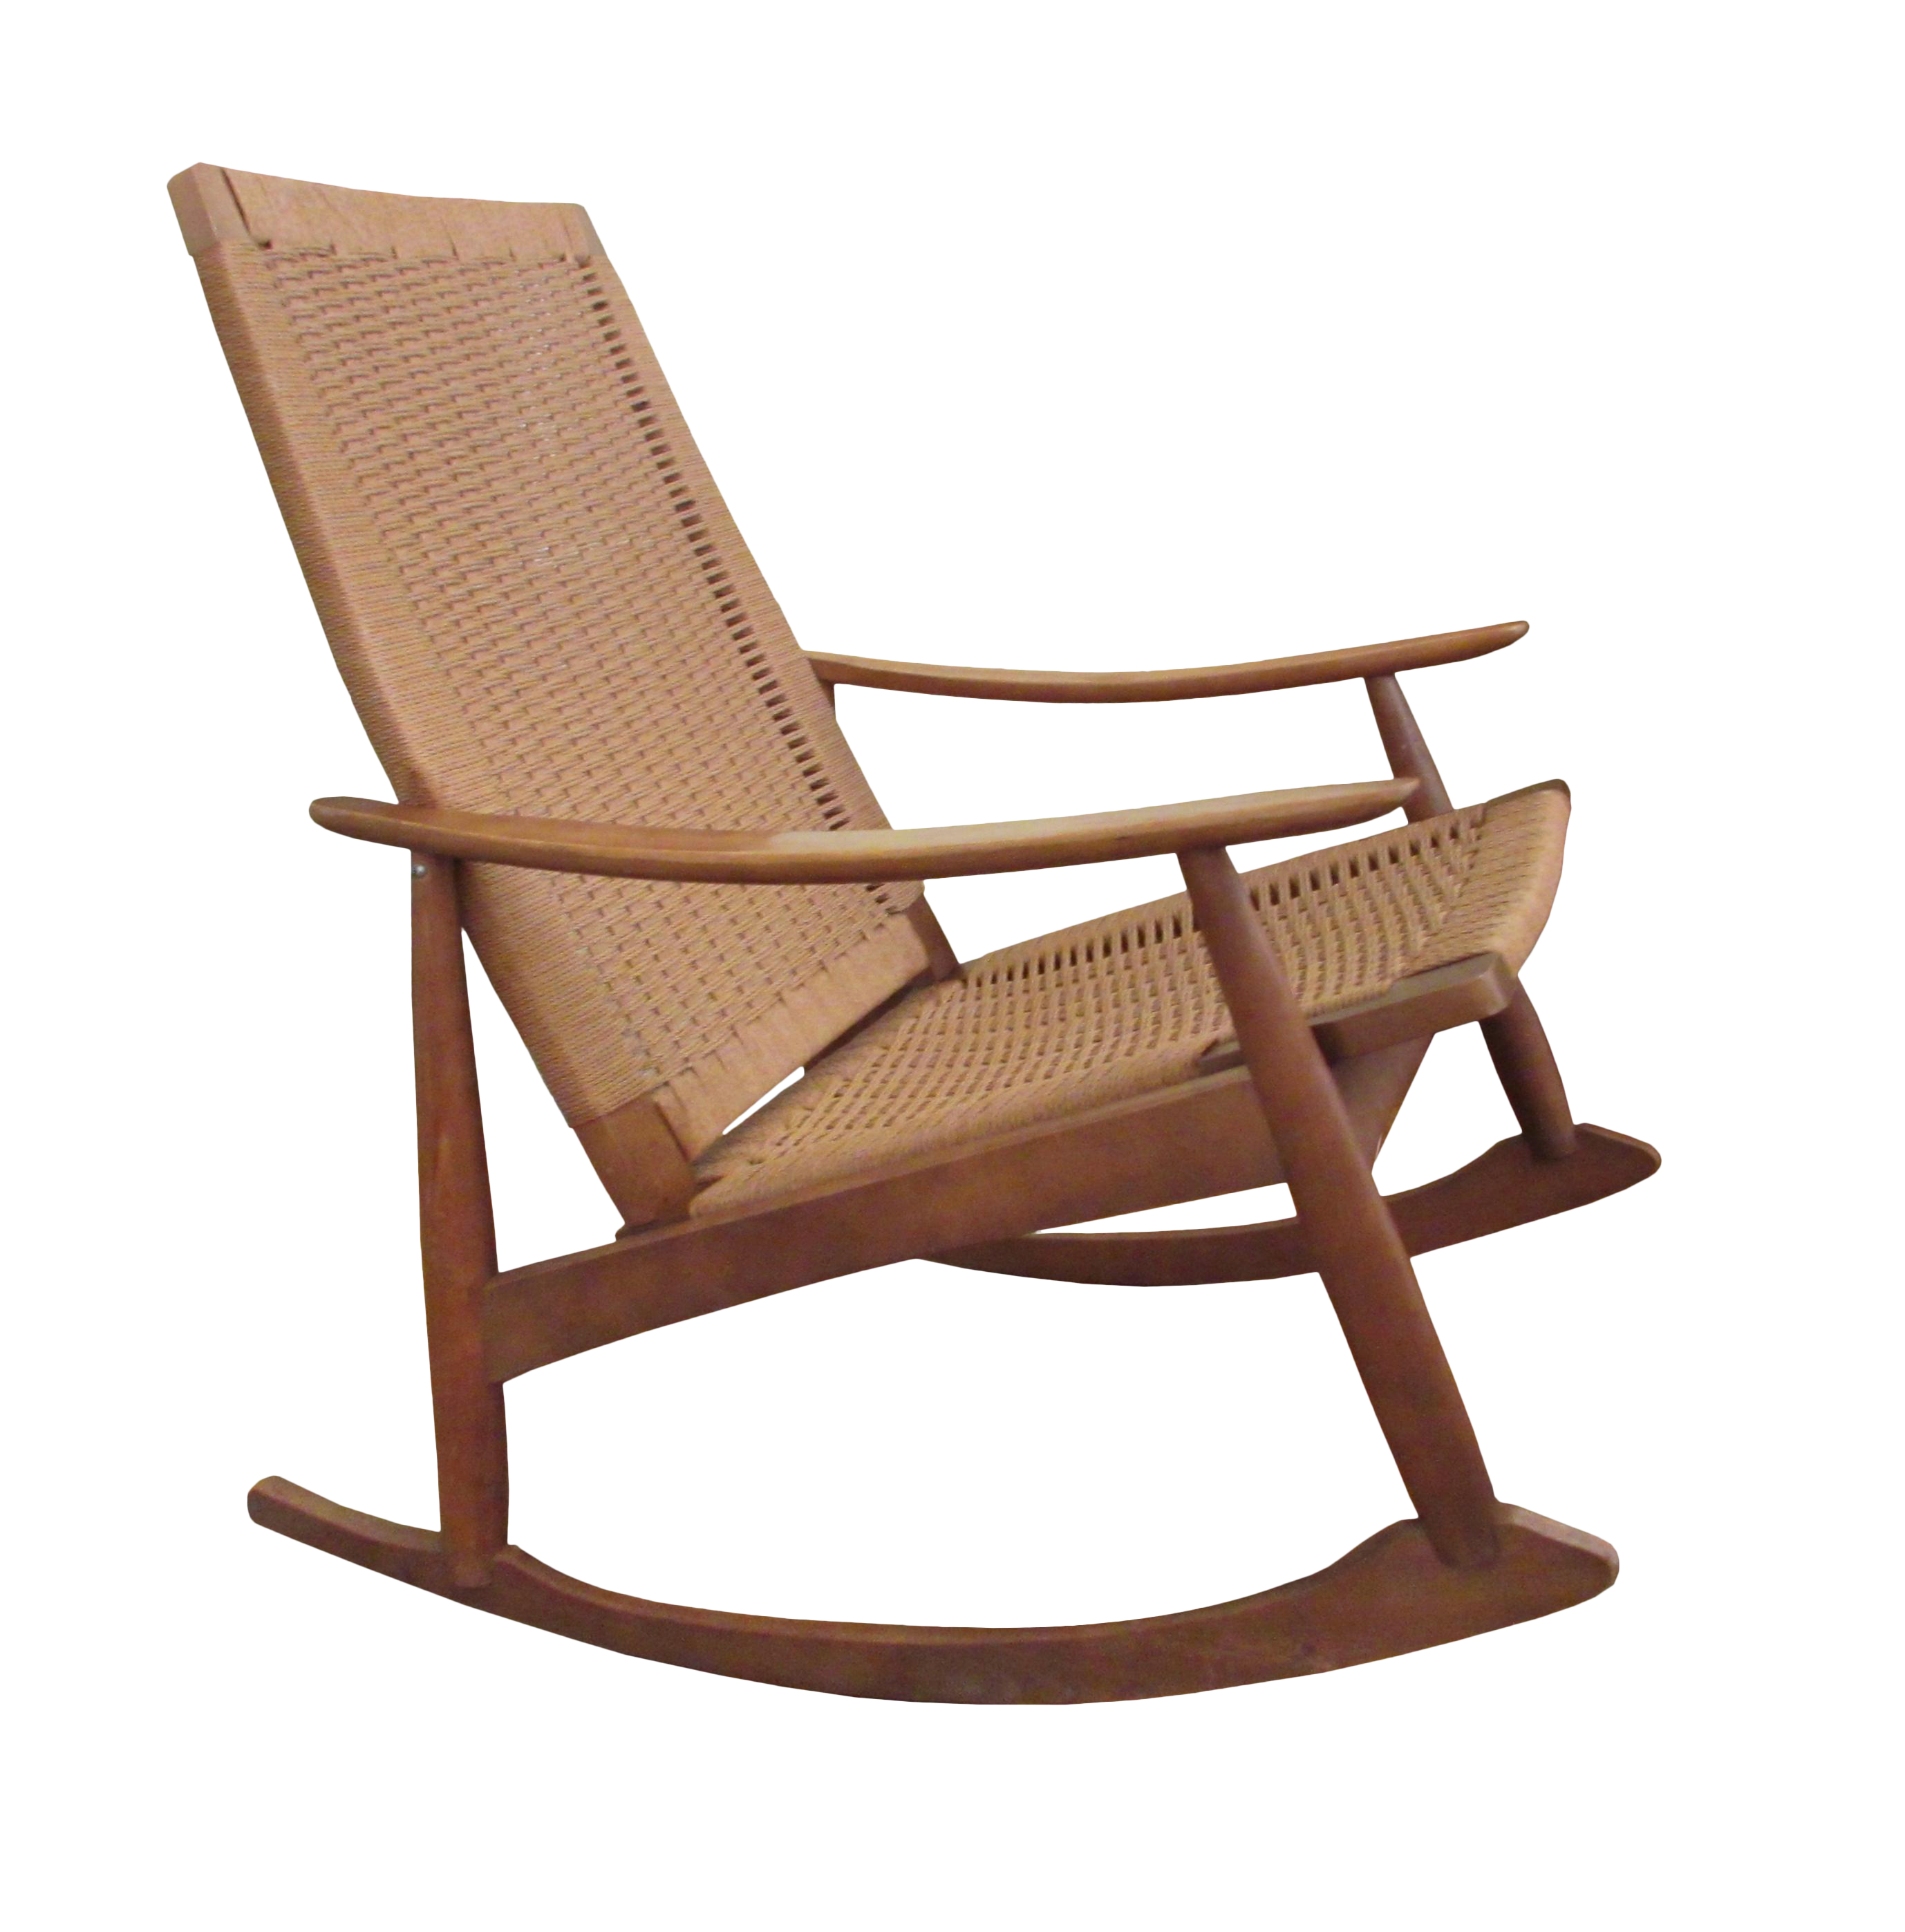 Mid Century Modern Hans Wegner Style Rope Seat Rocking Chair